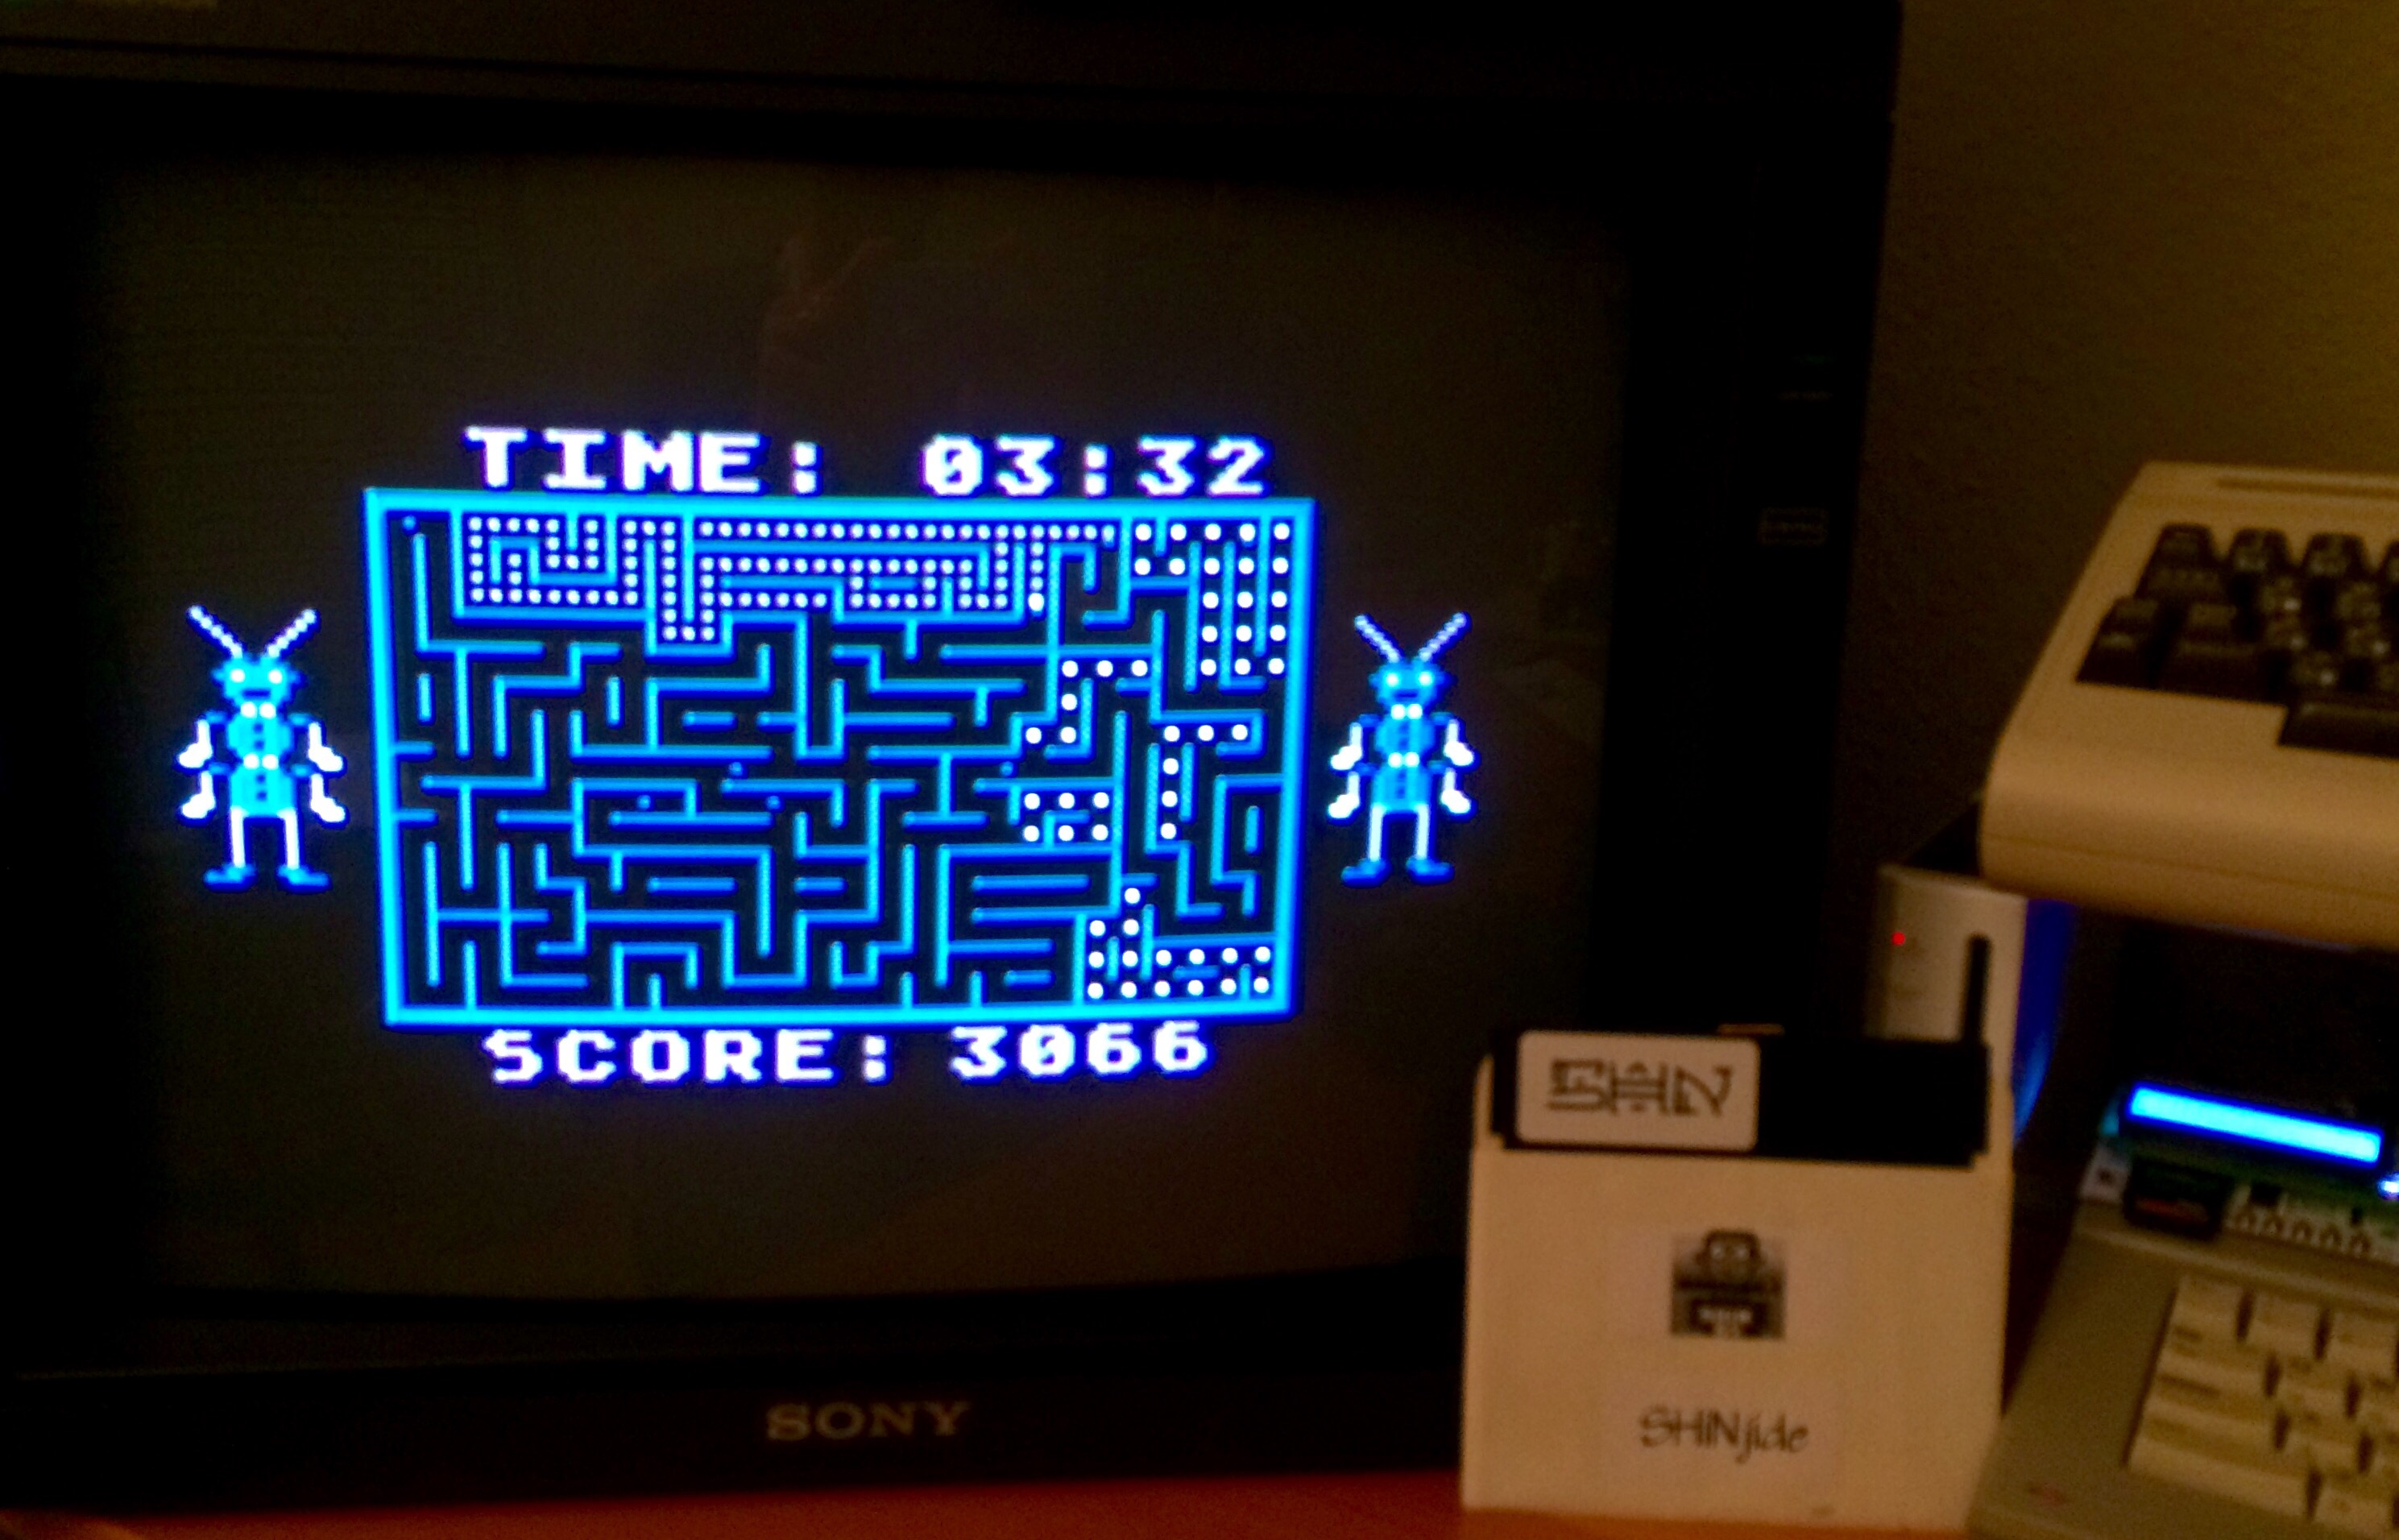 SHiNjide: Tumble Bugs (Atari 400/800/XL/XE) 3,066 points on 2015-02-15 14:41:20